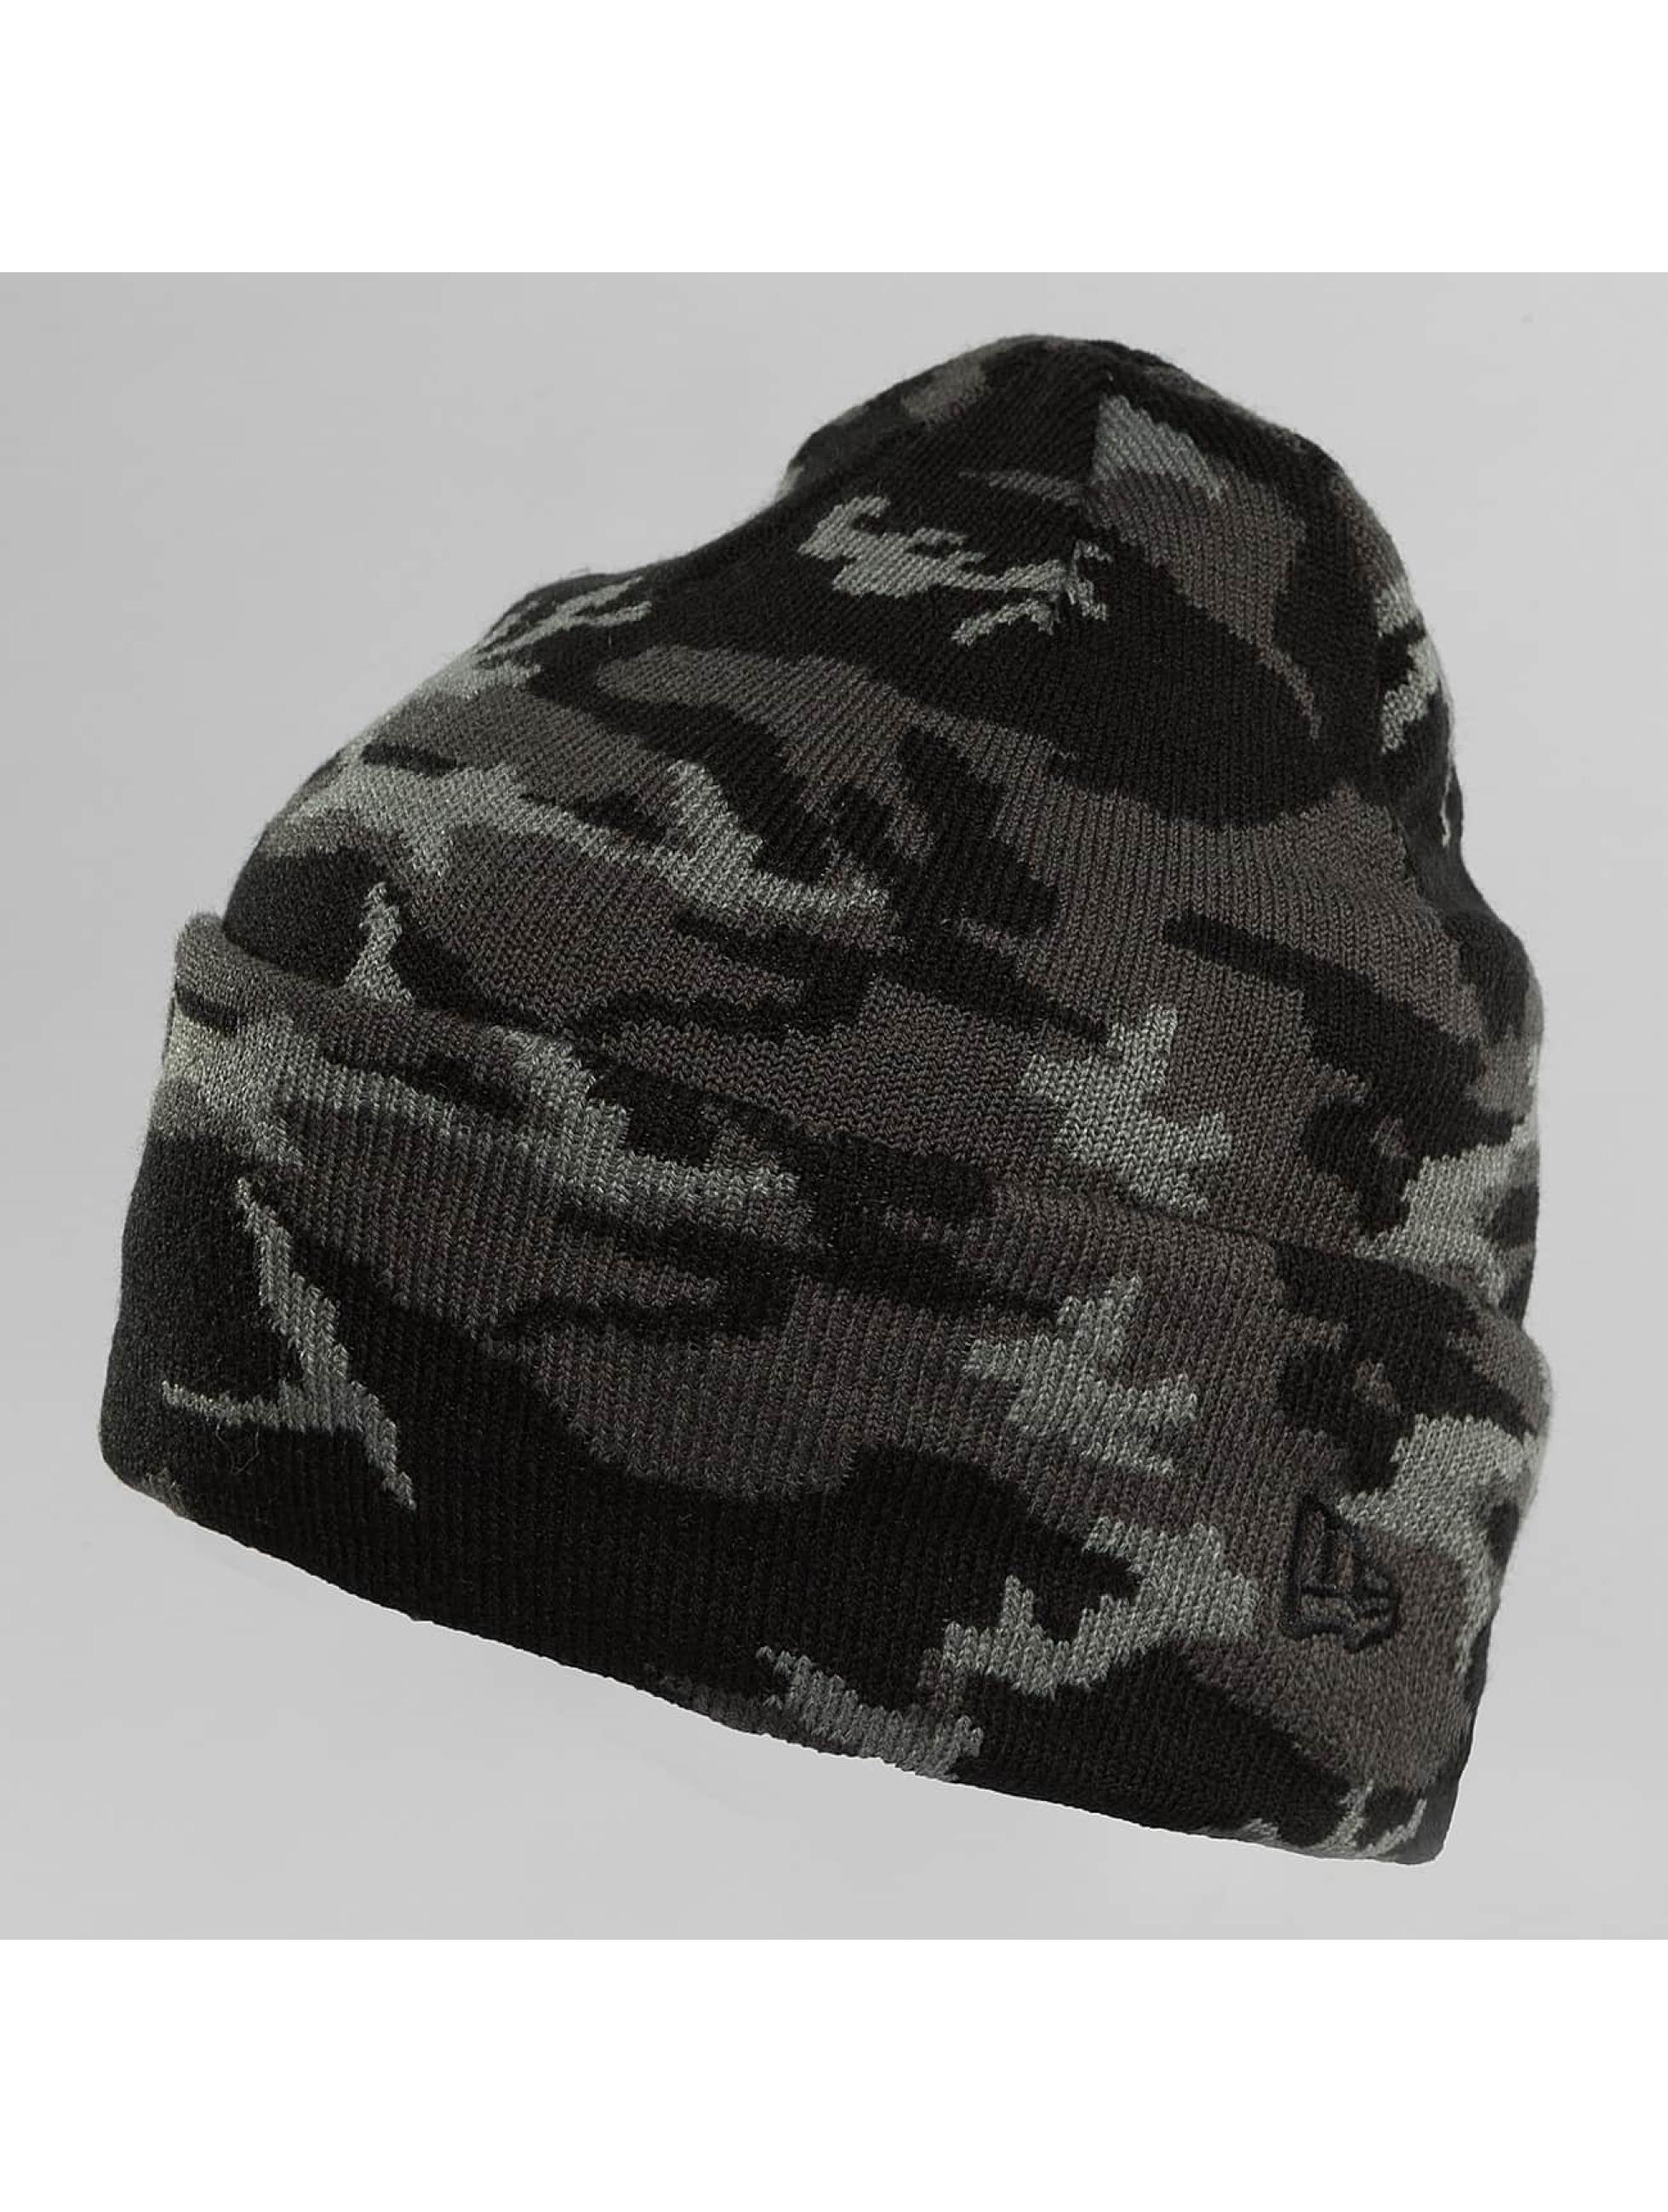 New Era Hat-1 New Era Camo Cuff Beanie black